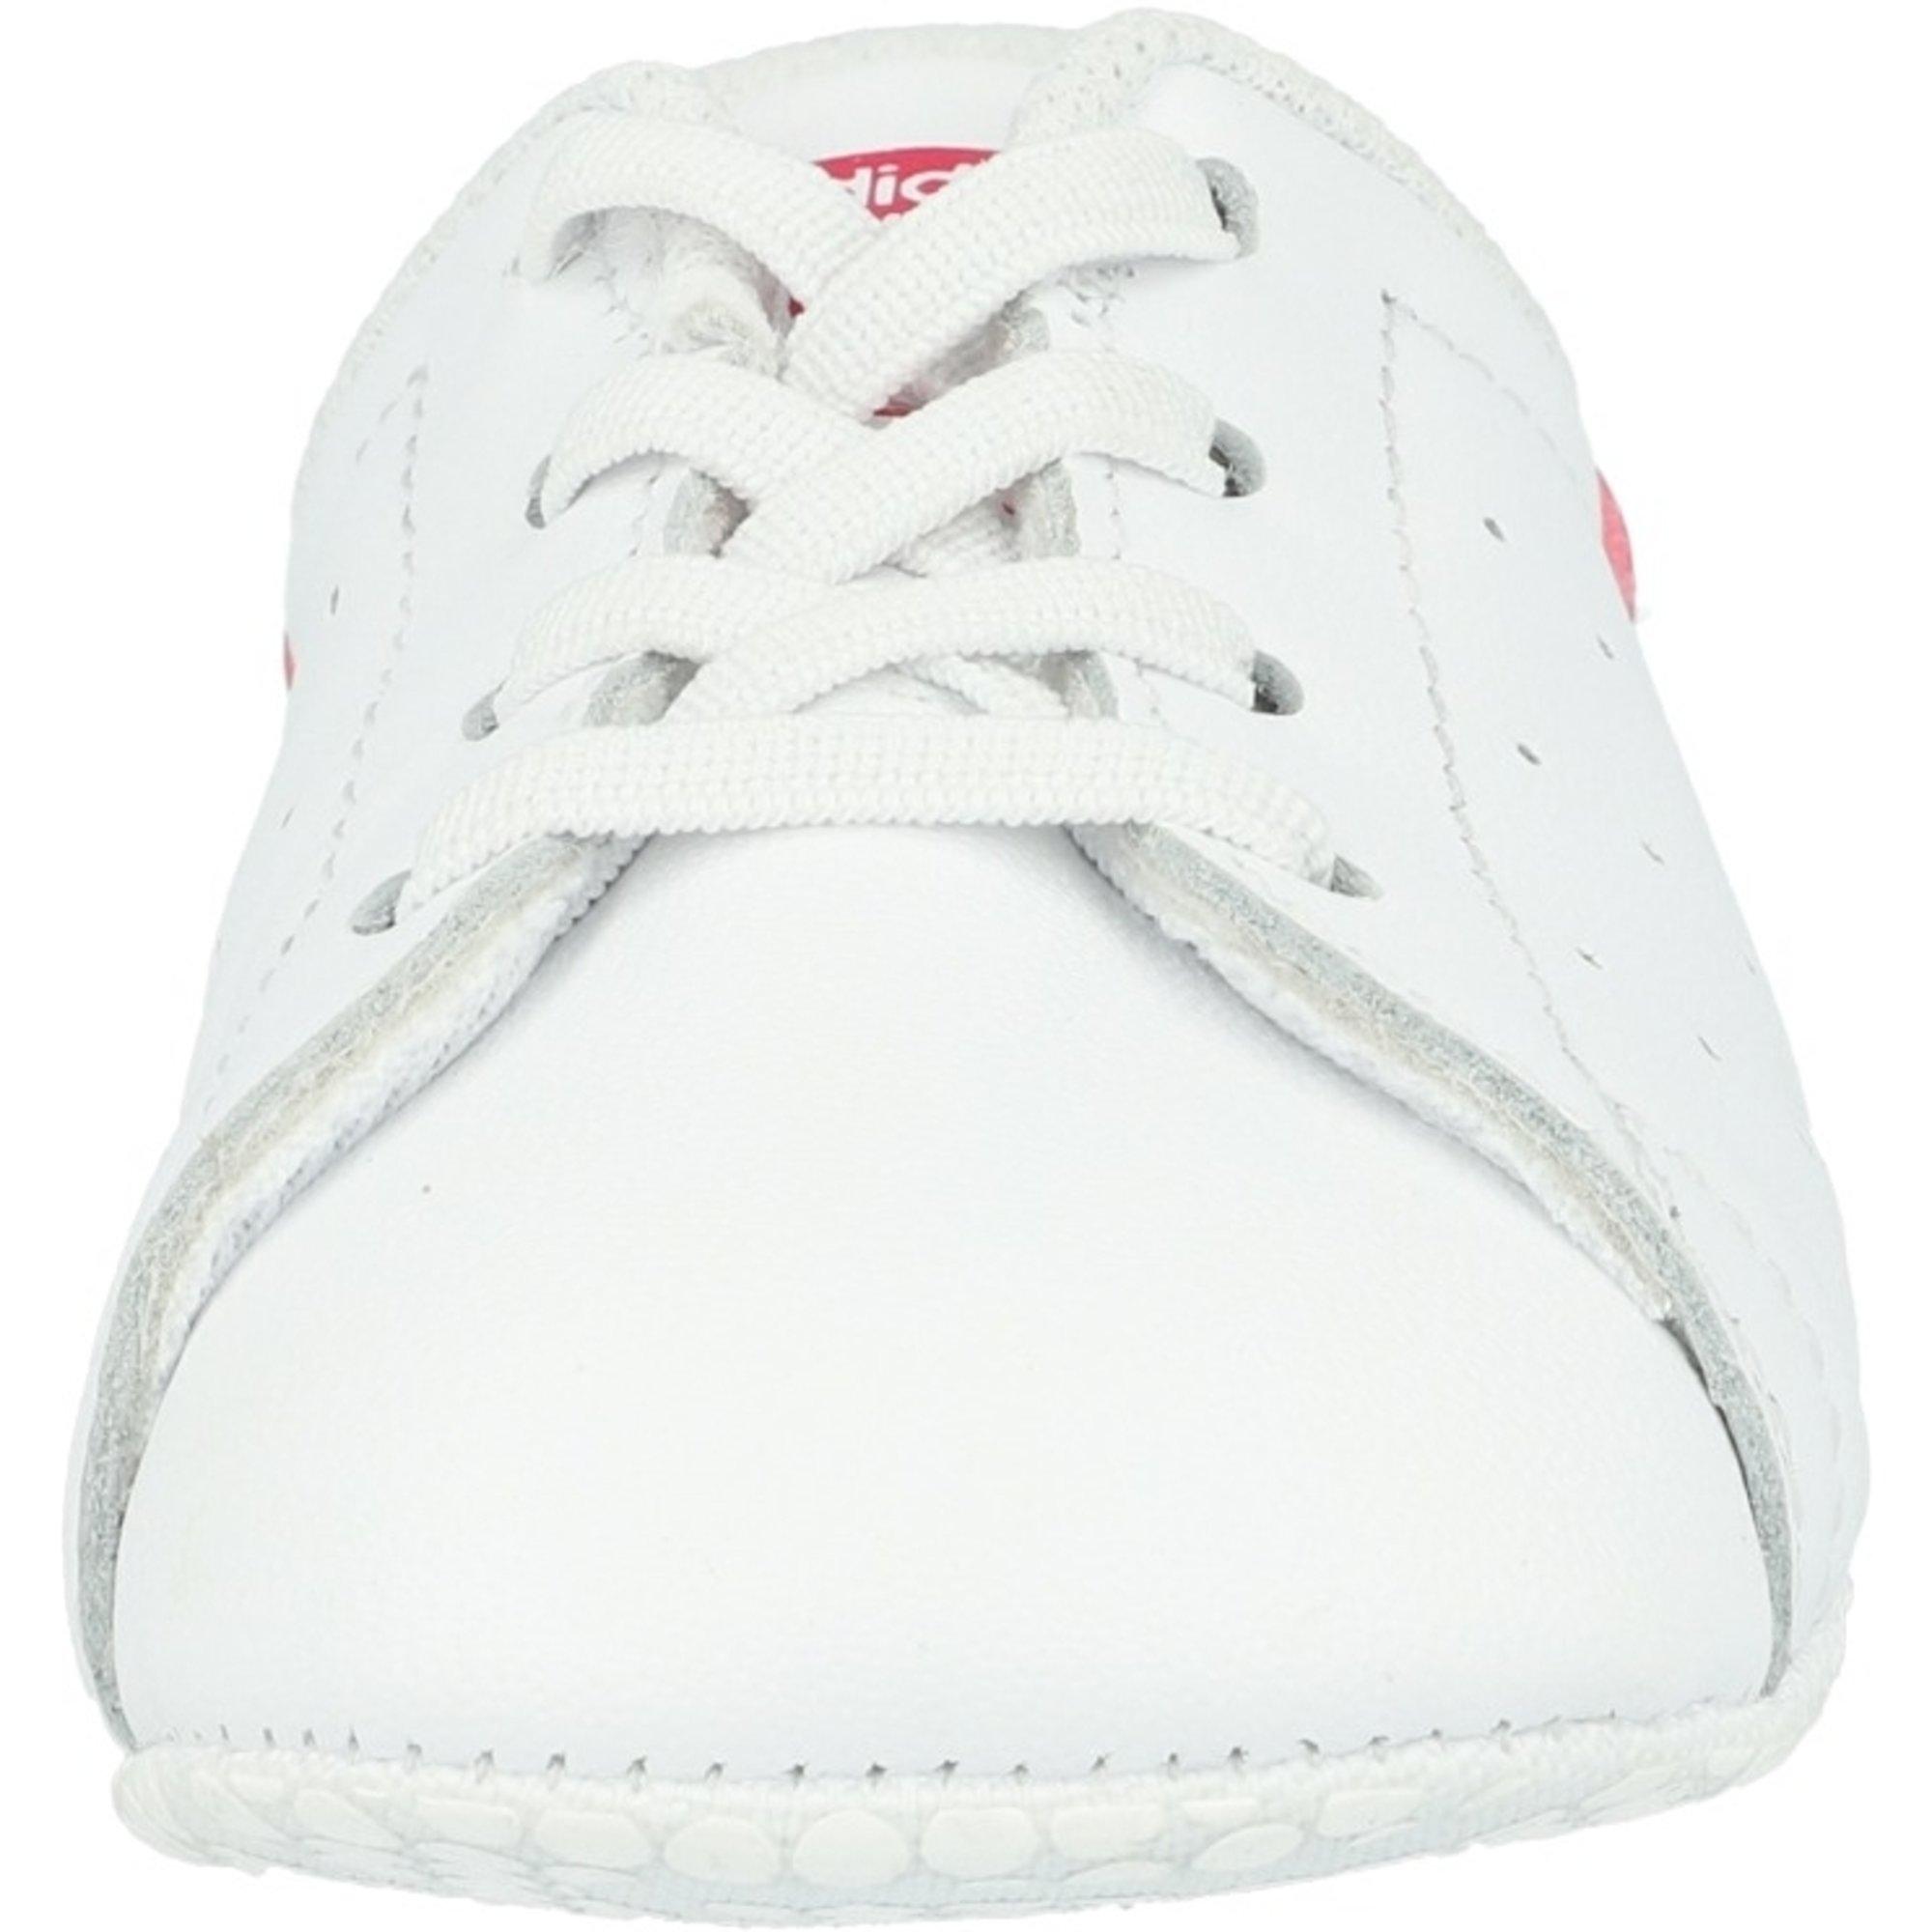 adidas Originals Stan Smith Crib White/Bold Pink Leather